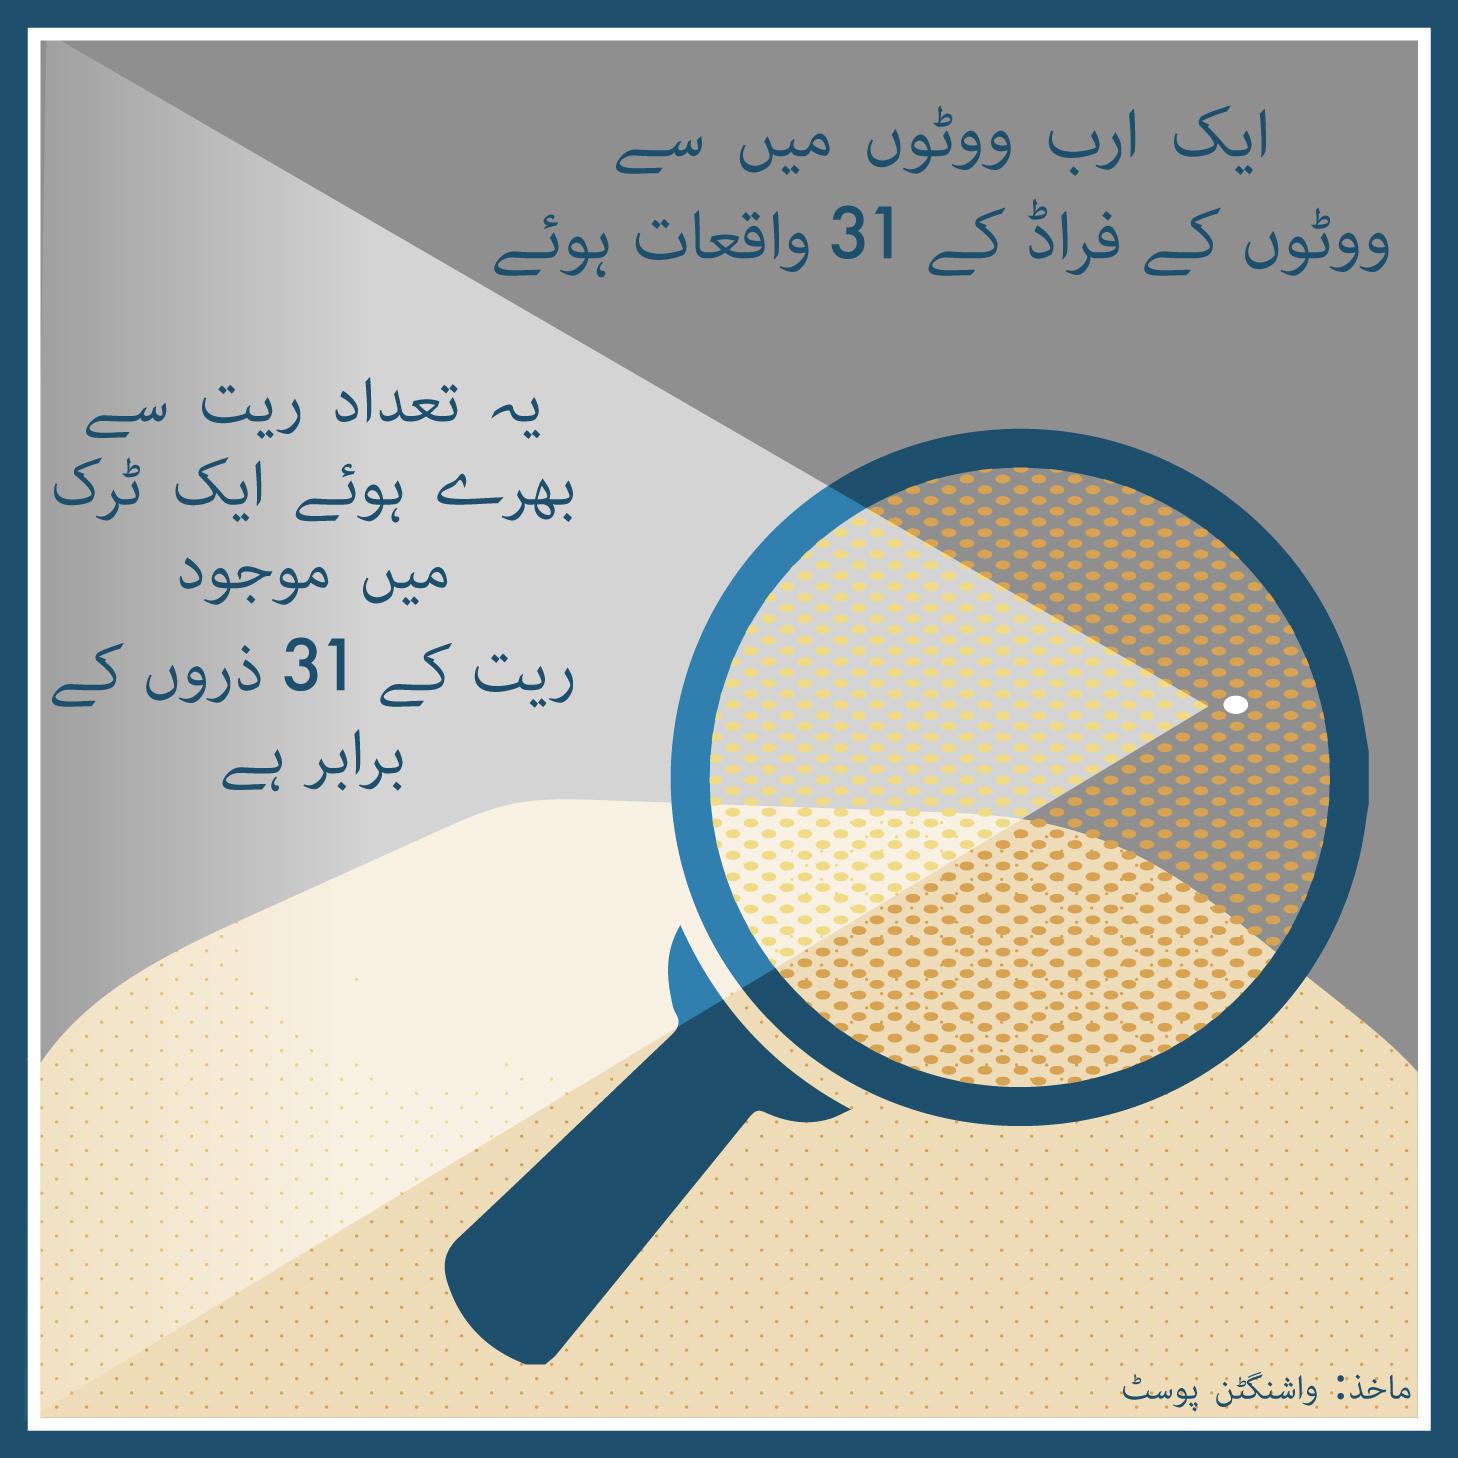 Billion_Urdu